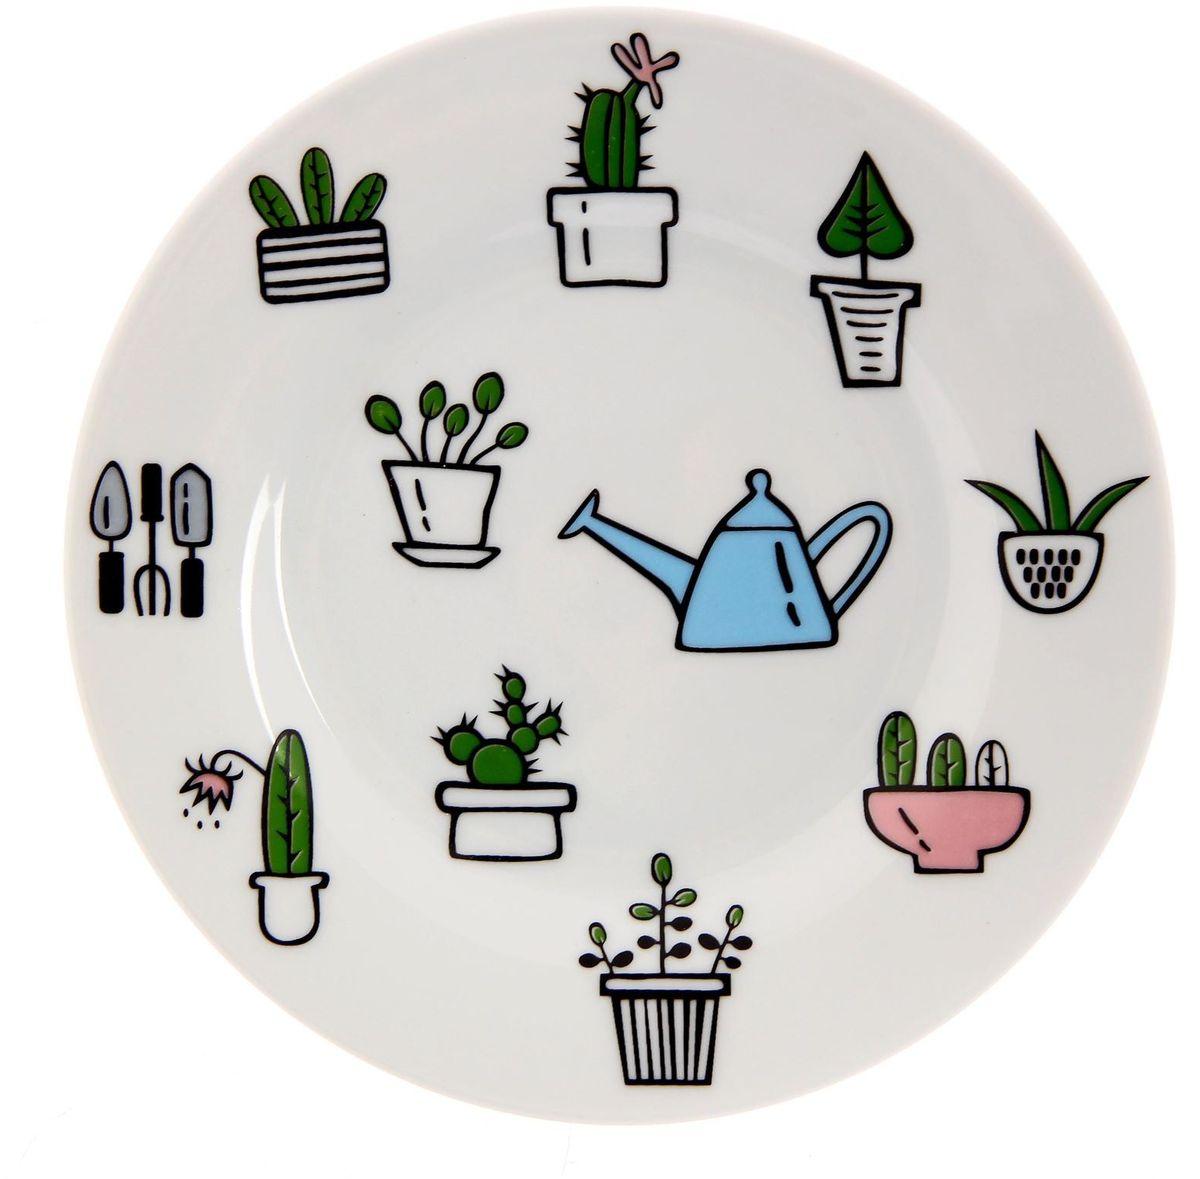 Тарелка мелкая Сотвори чудо Домашний сад, диаметр 15,5 см тарелка мелкая сотвори чудо воздушный город диаметр 20 см